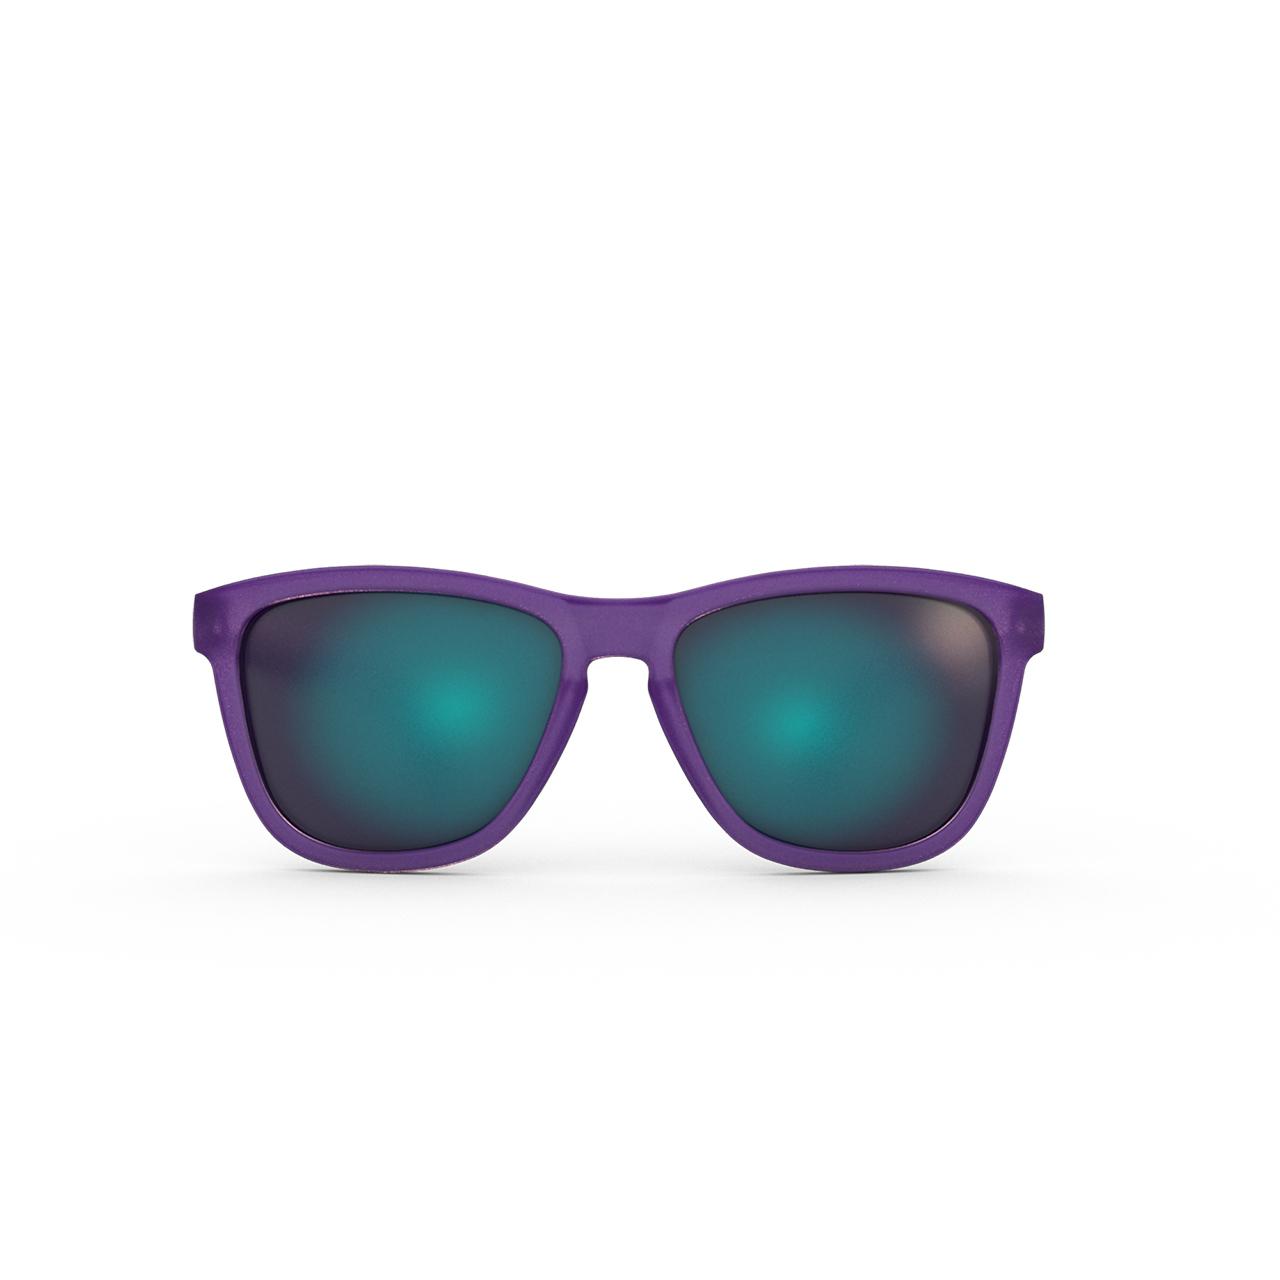 6155d5c0c1bb goodr® Running Sunglasses - No Slip. No Bounce. | Fleet Feet